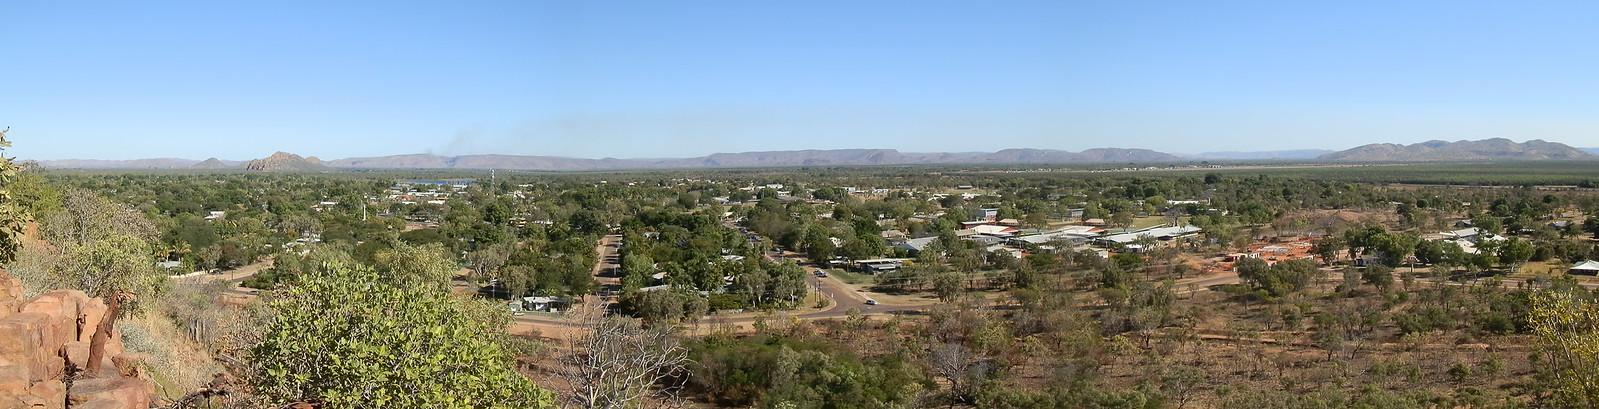 Kununurra from Kellys Knob Lookout, Kimberley, Western Australia